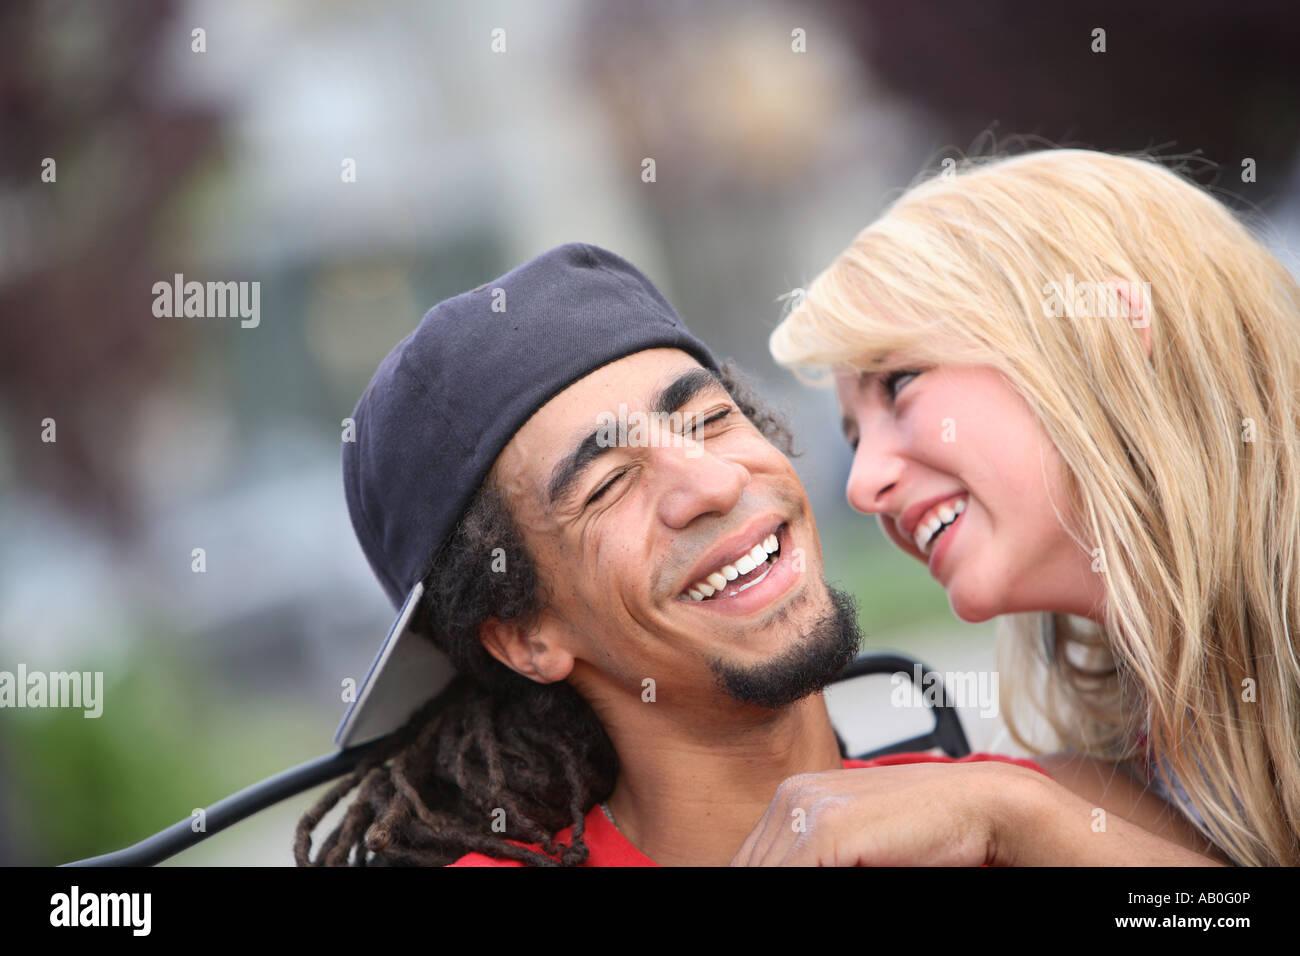 Pareja joven sonriente junto Imagen De Stock